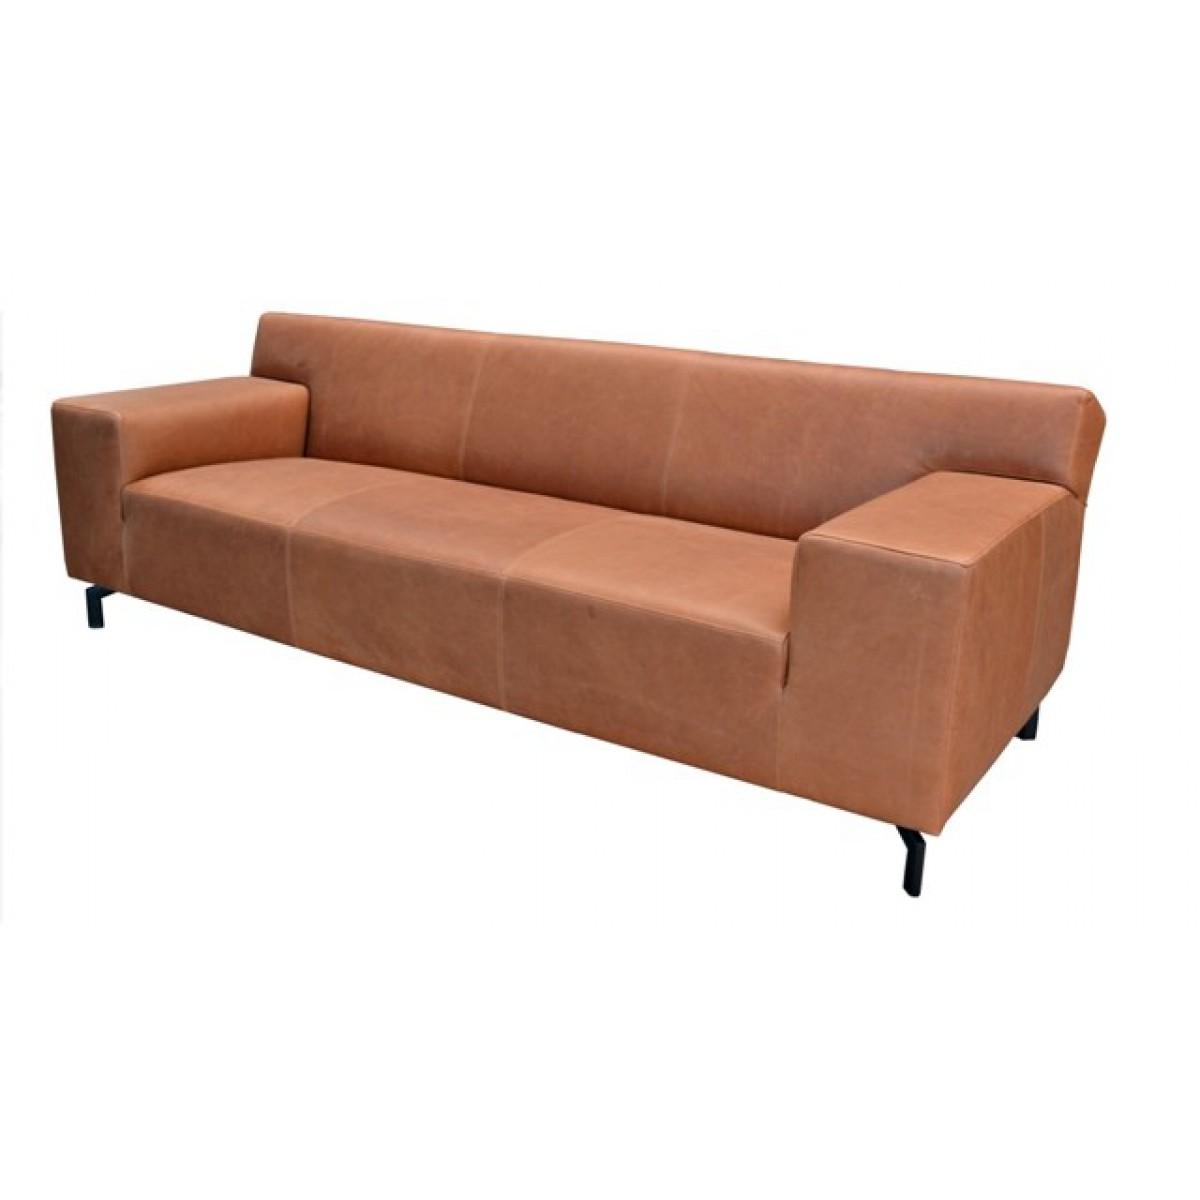 brent_design_bank_rancho_leder_cognach_jame_meubelen